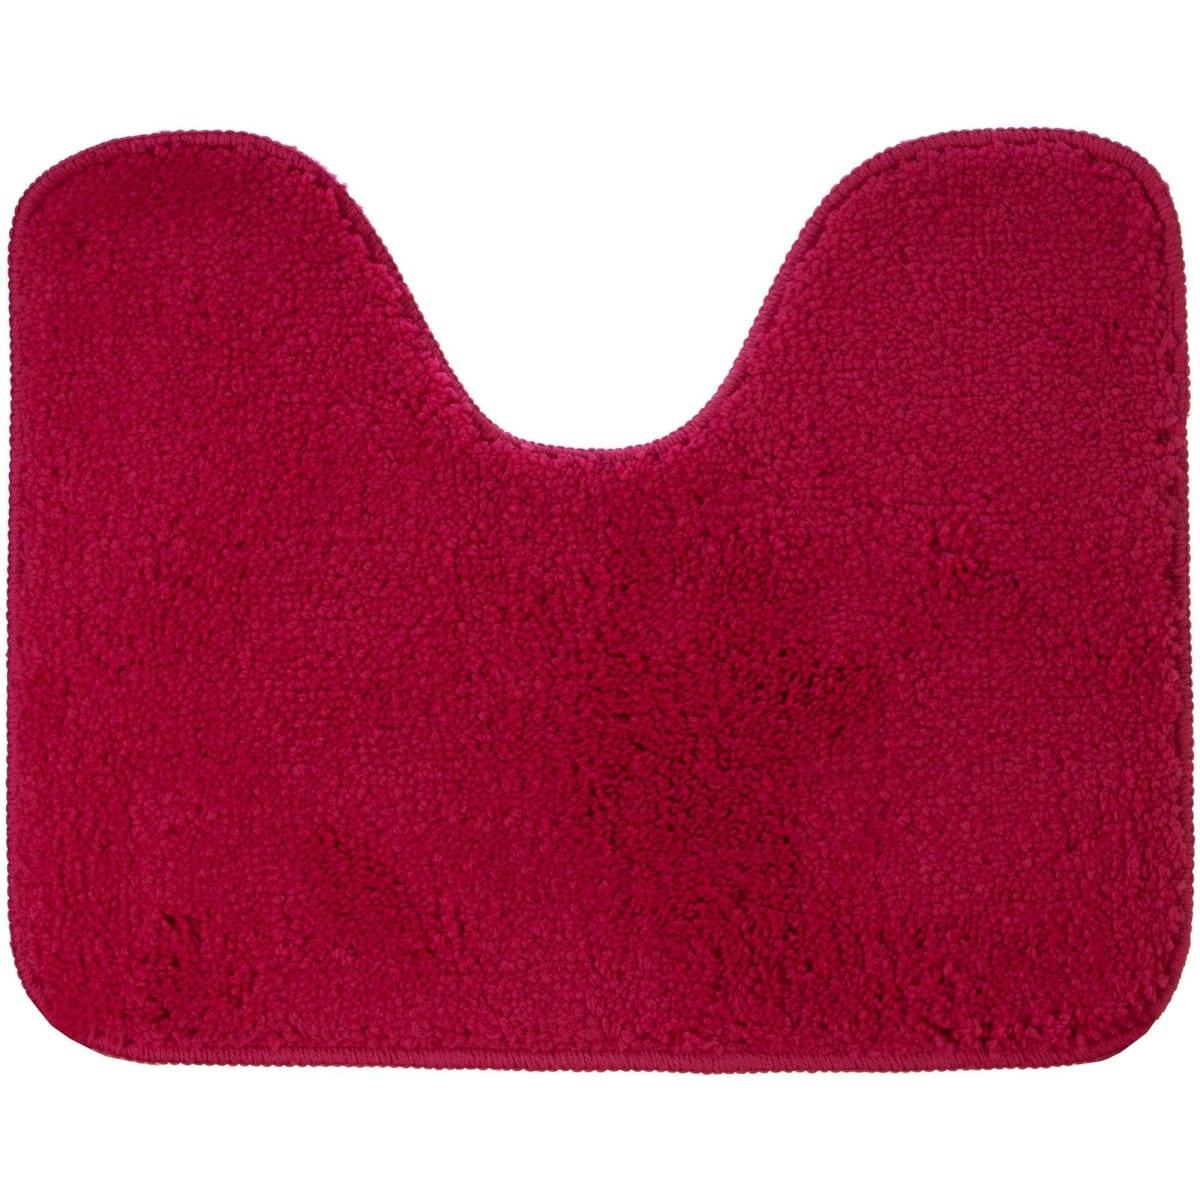 Коврик для туалета Sensea Lounge №3, 50х40 см, микрофибра, цвет розовый